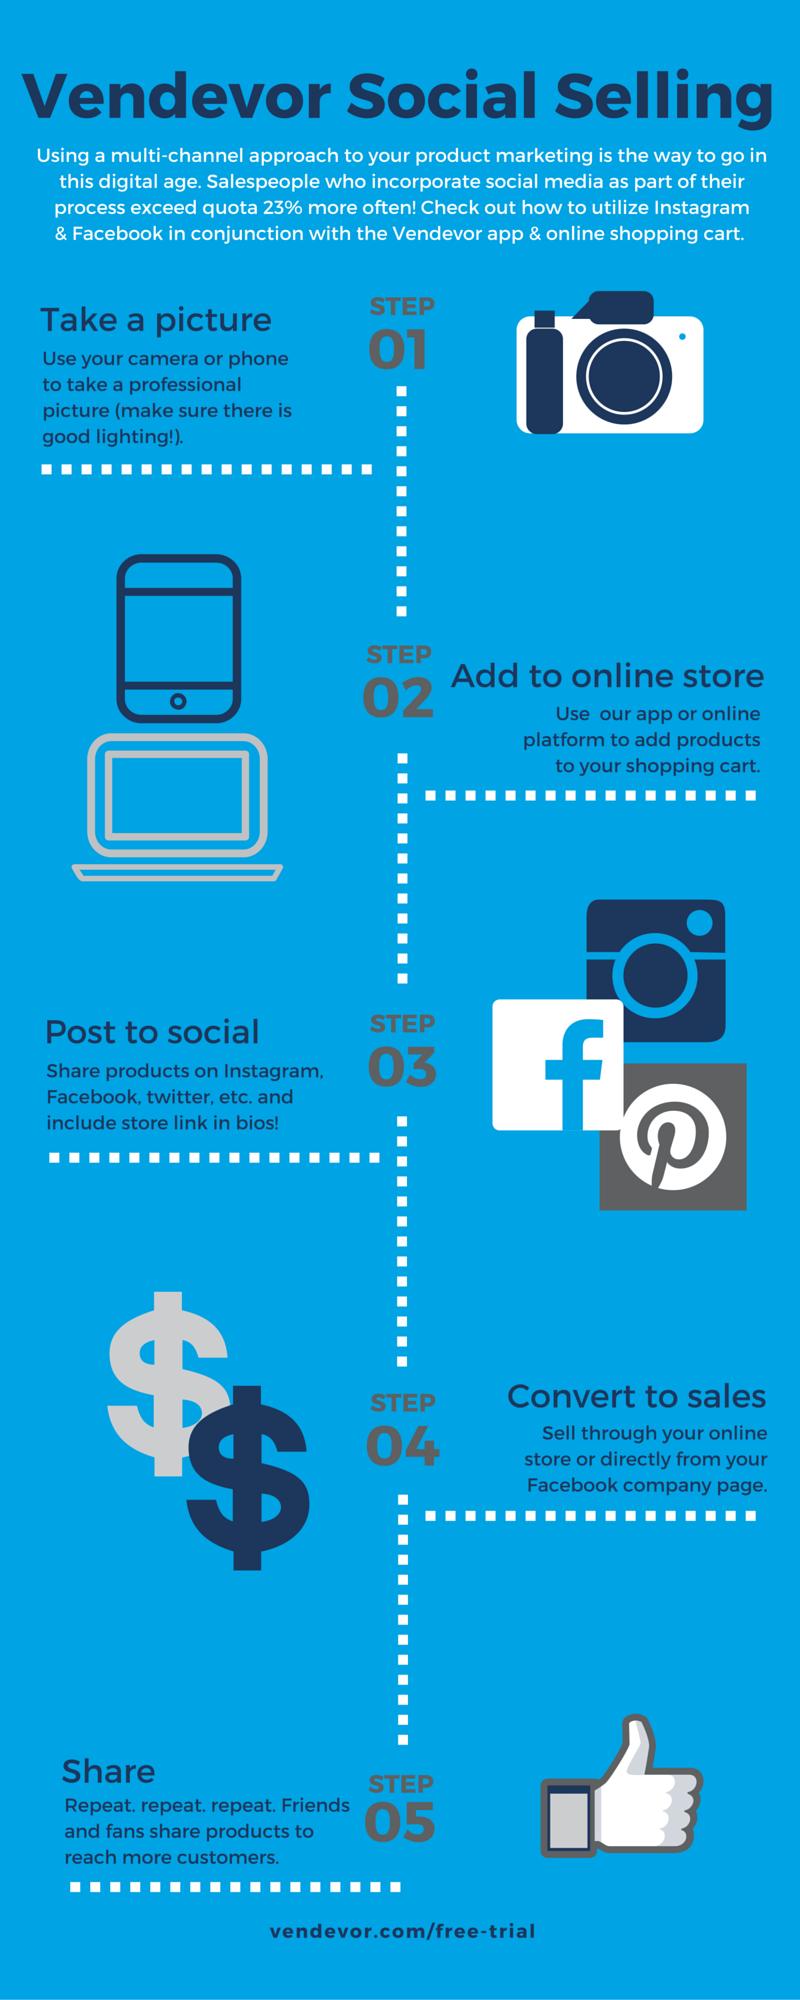 Vendevor-Social-Selling-Infographic (1)